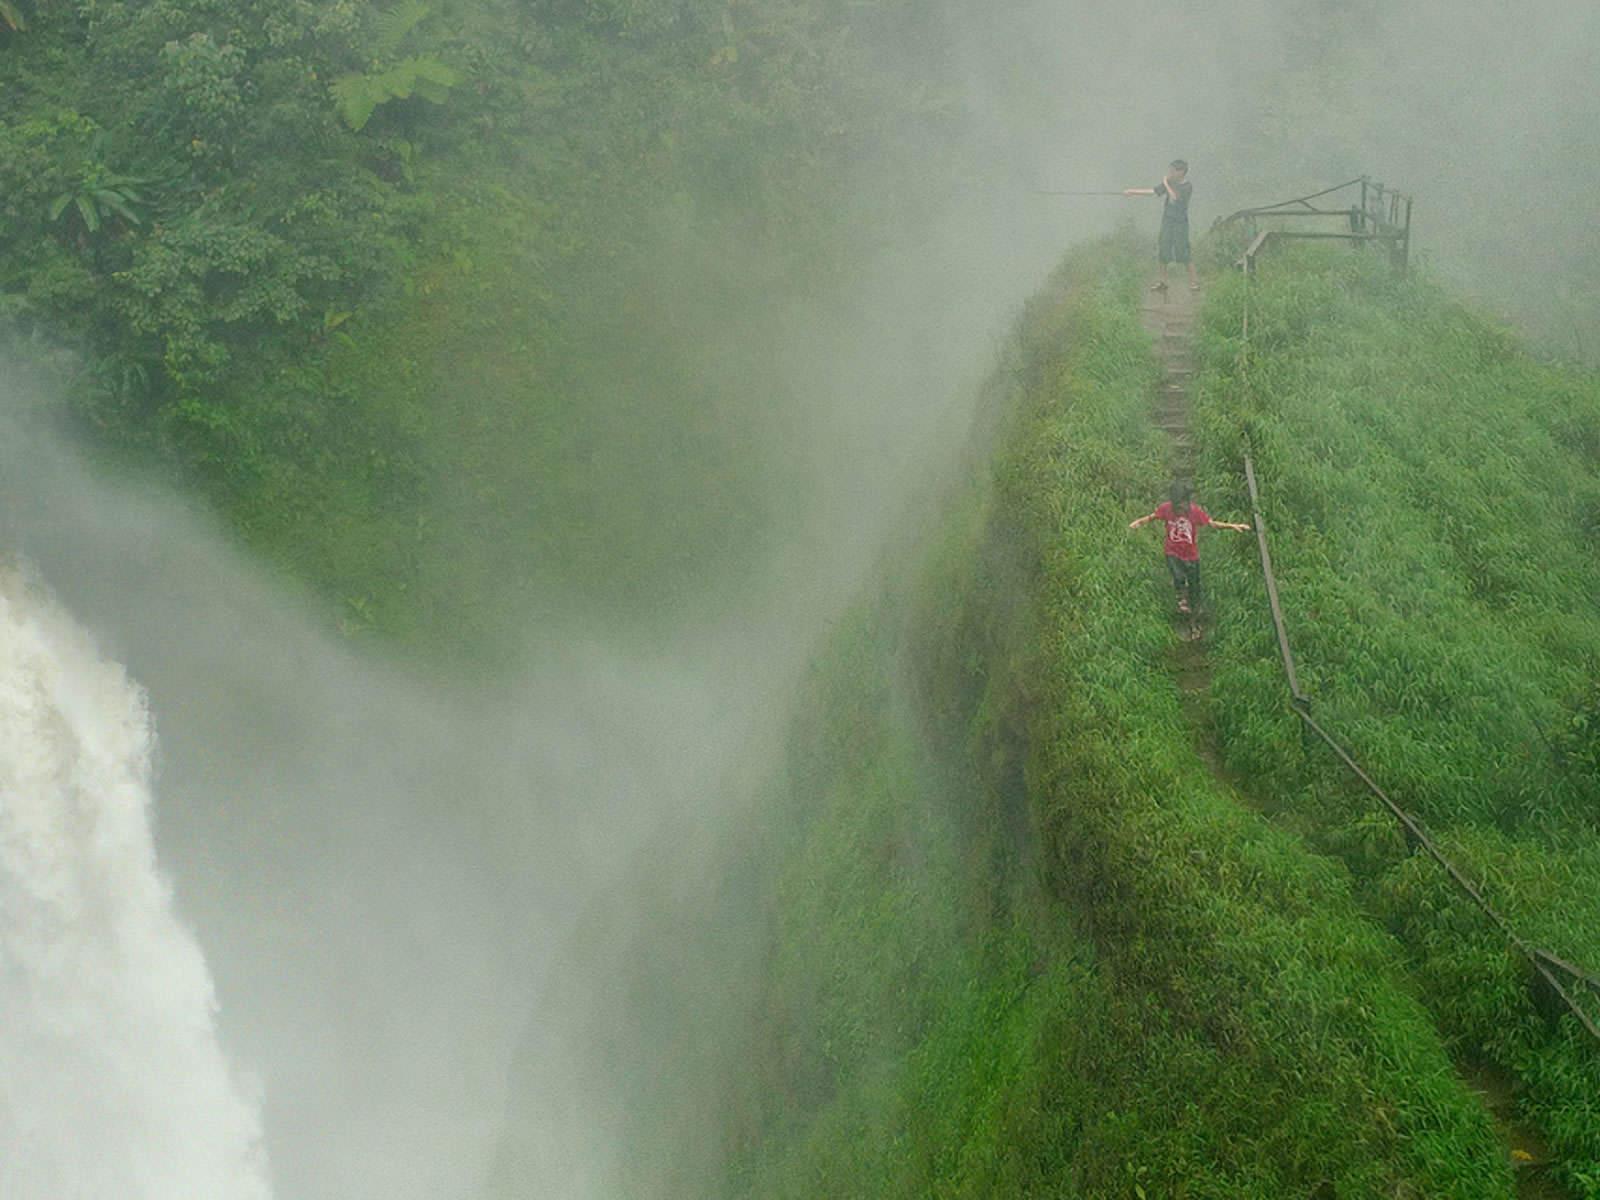 45 rainy forest wallpaper on wallpapersafari - Rainy nature hd wallpaper ...